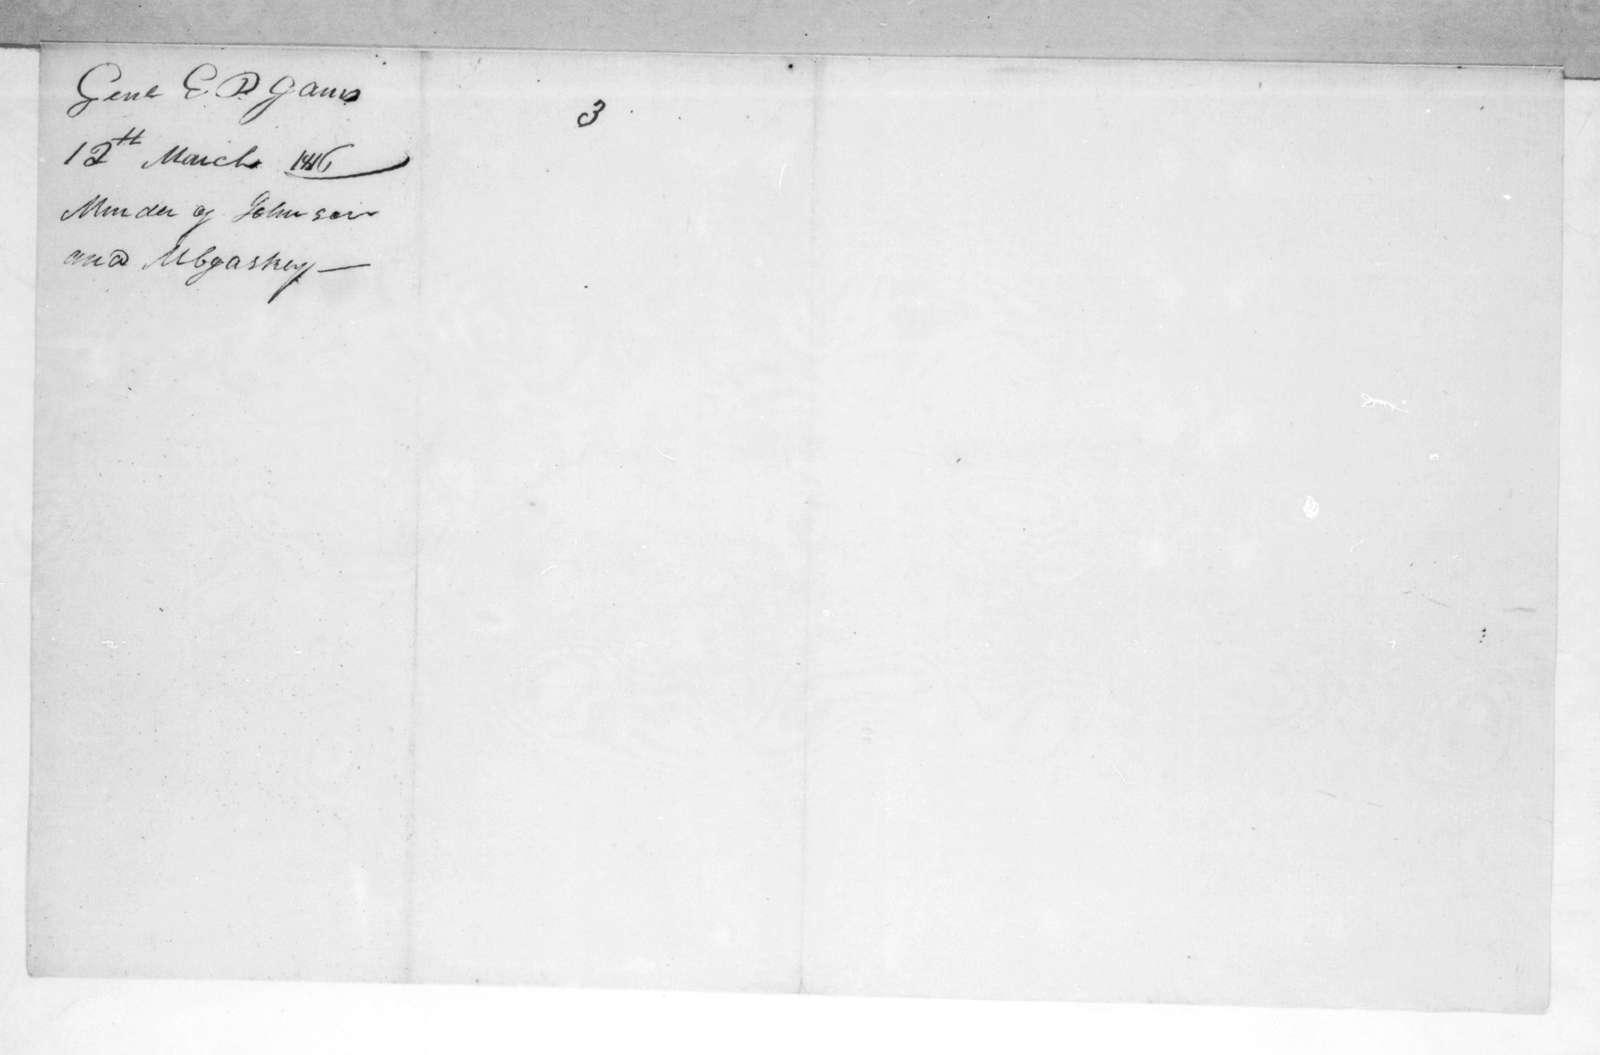 Edmund Pendleton Gaines to Andrew Jackson, March 12, 1816